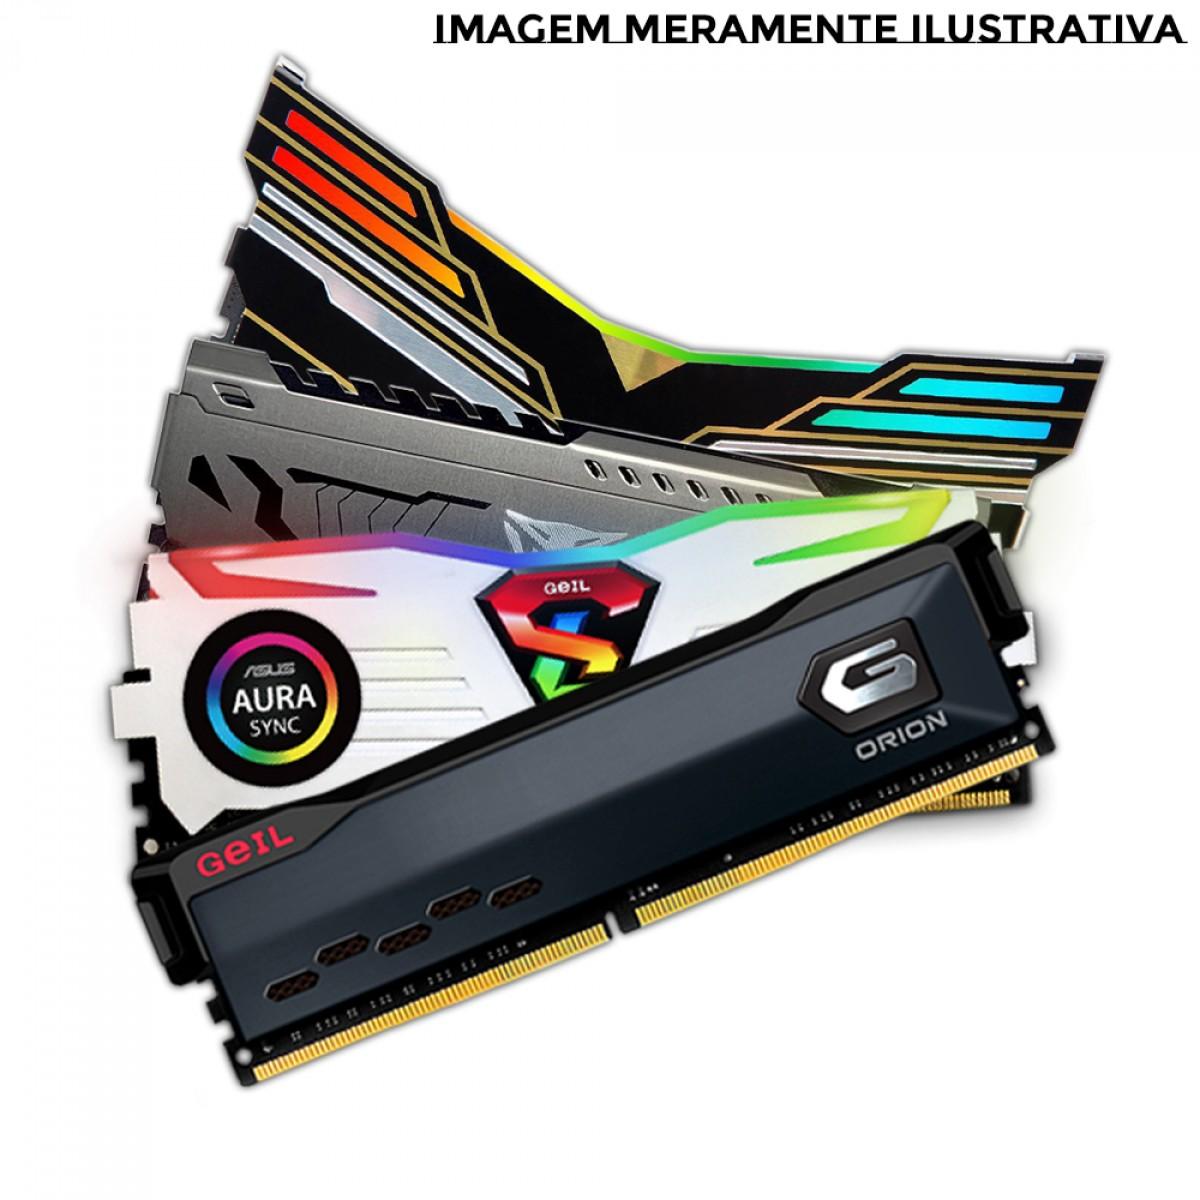 Kit Upgrade, Asus Prime H310M-E + Intel Core i3 9100F + 16GB DDR4 3000MHz